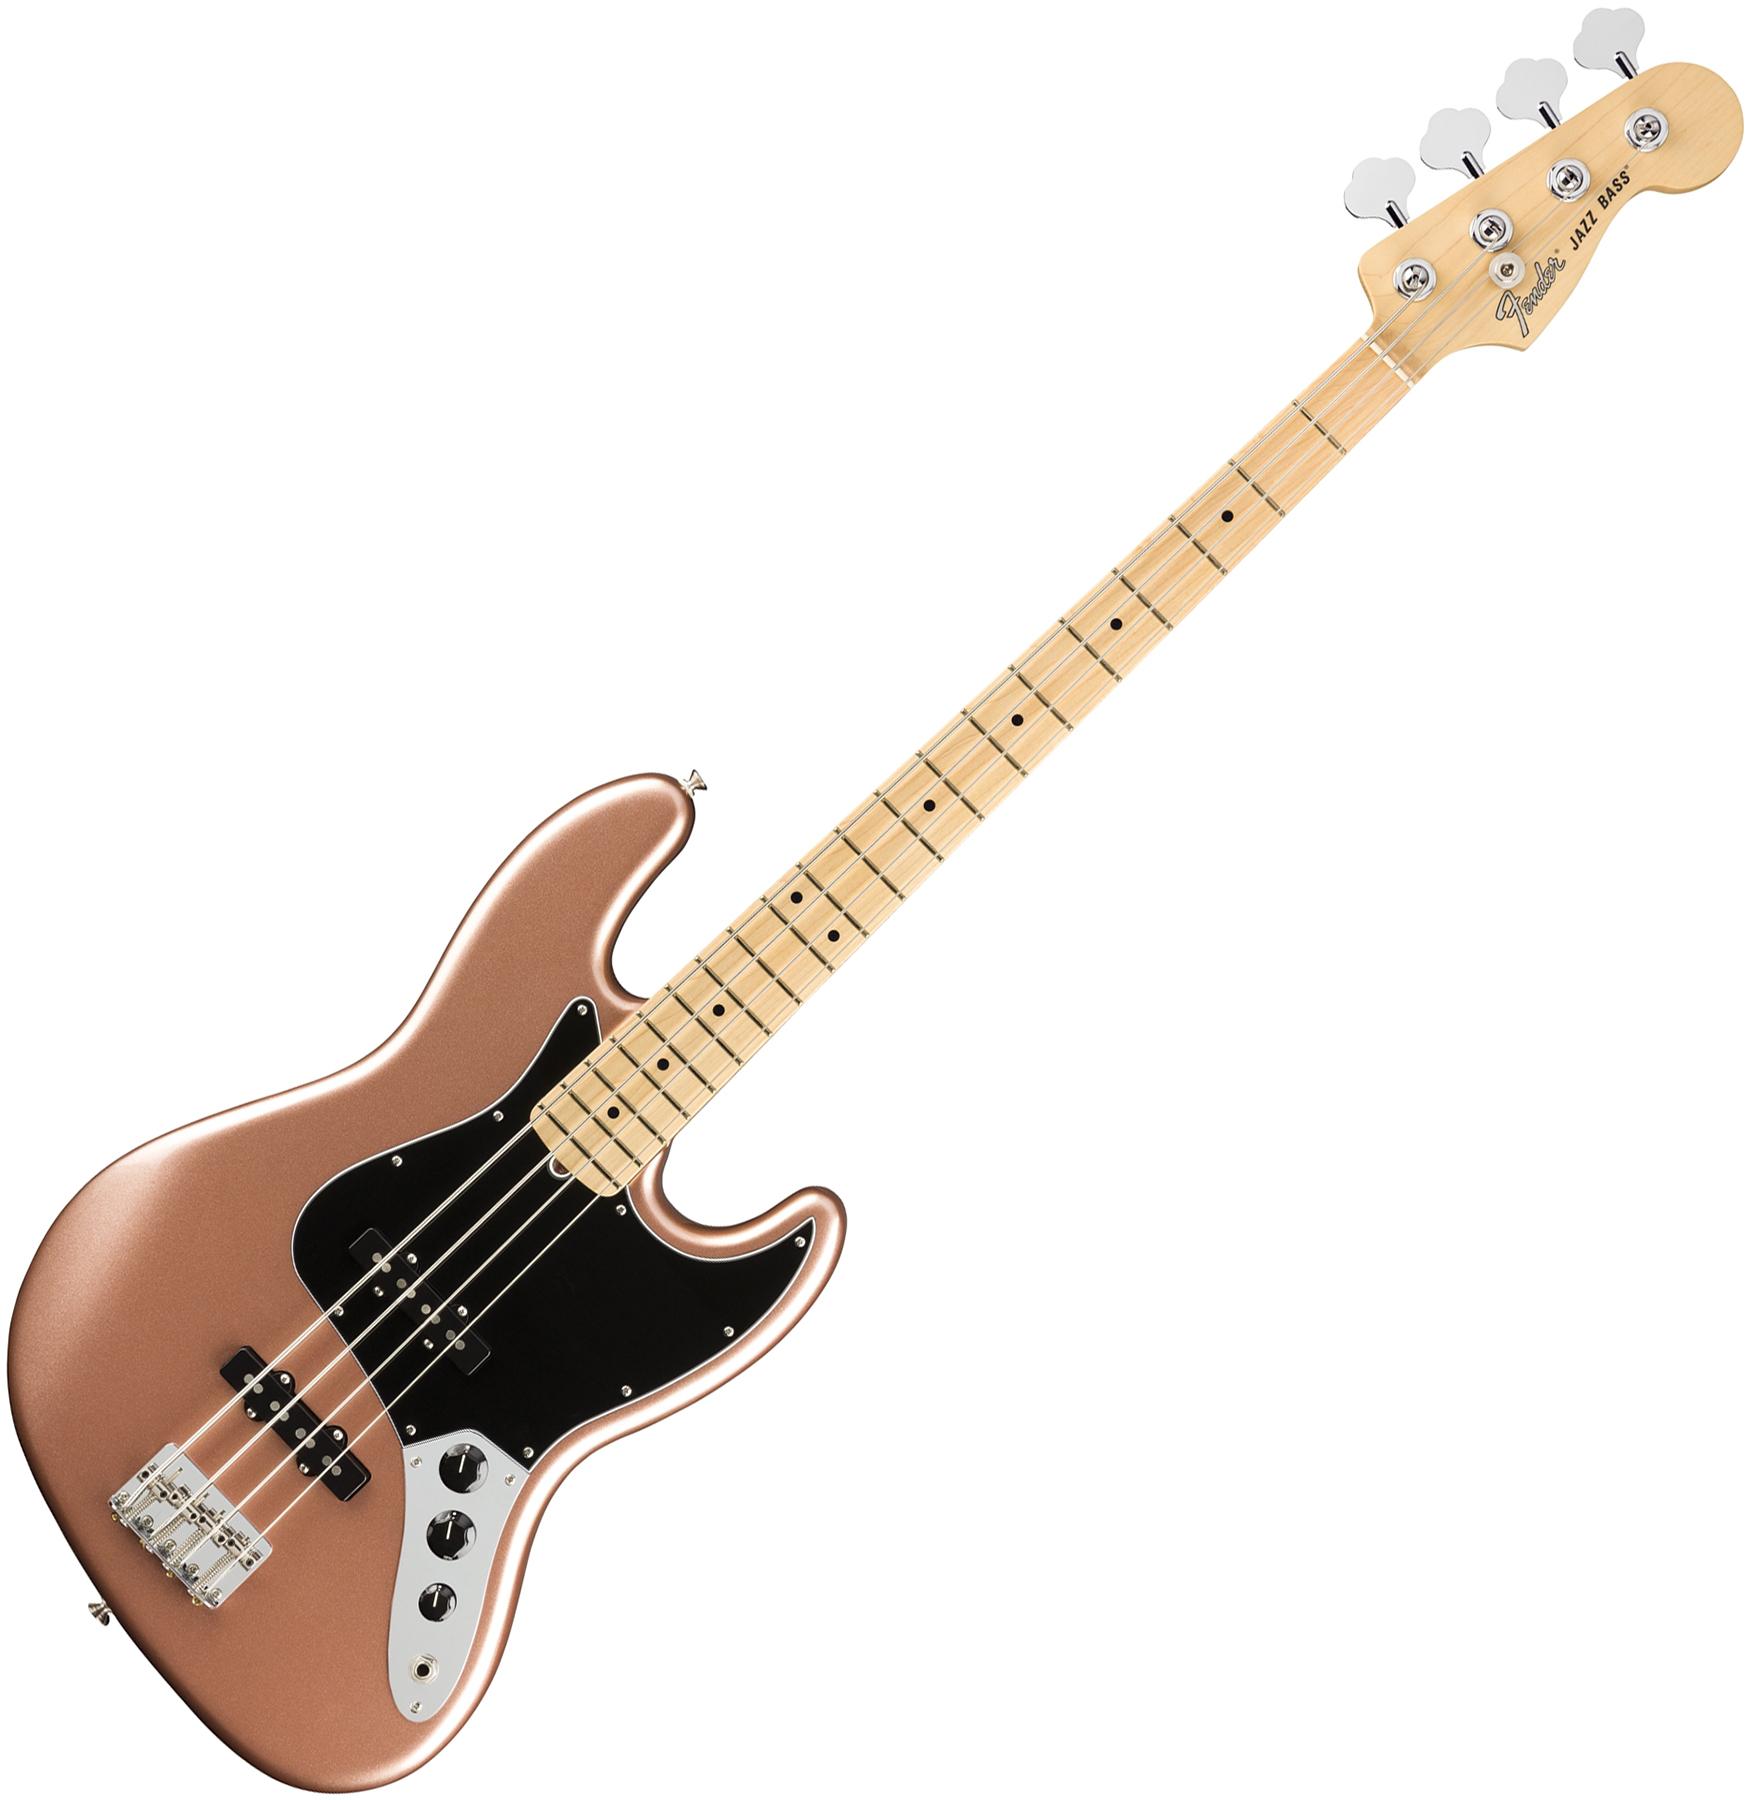 Guitare basse Fender American Performer Jazz Bass - Penny (stars-music.fr)